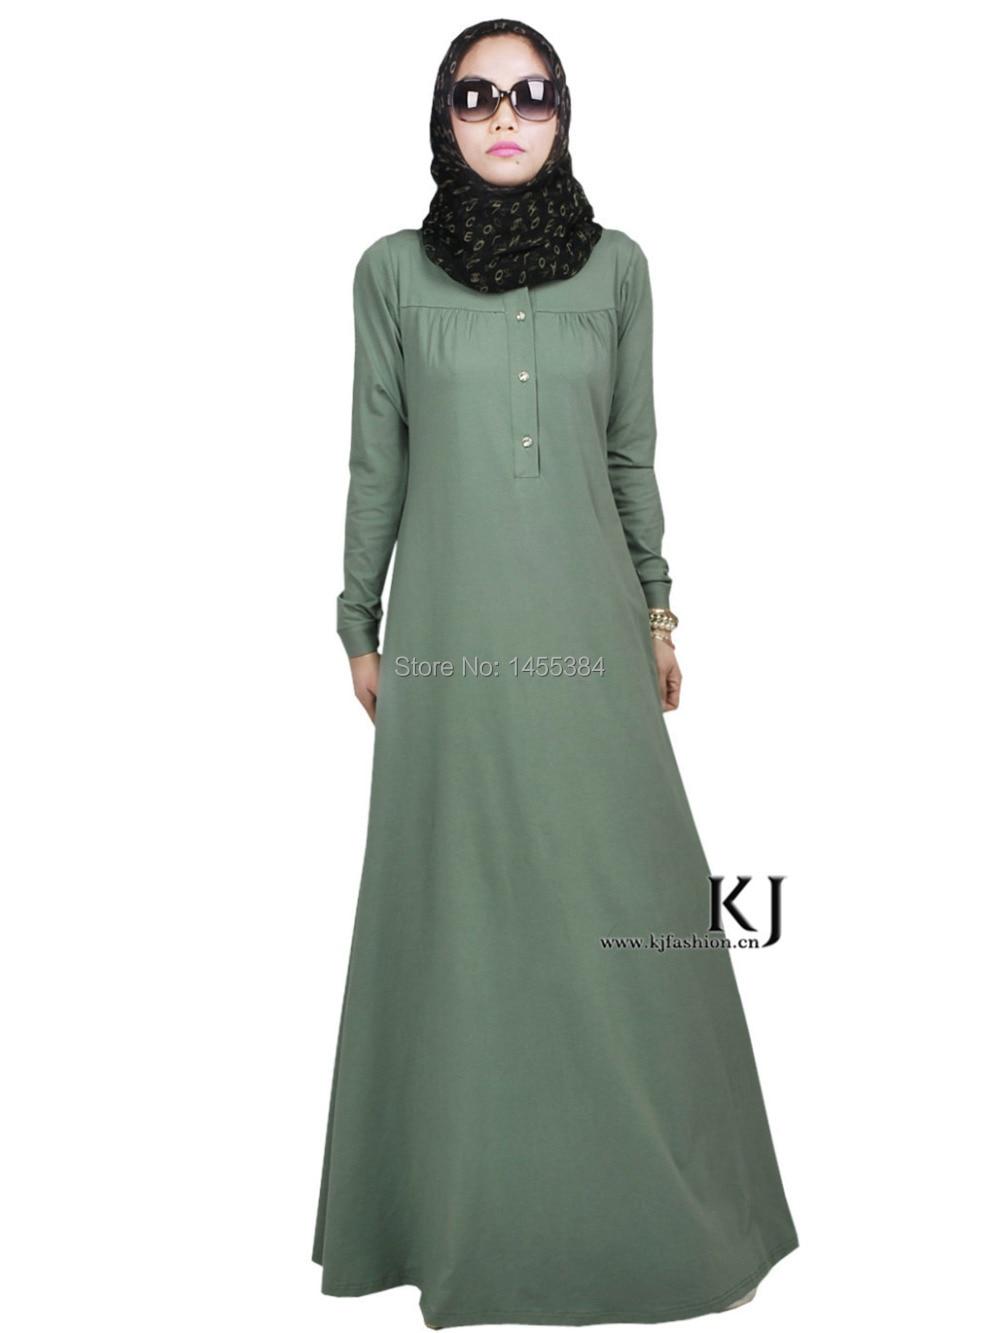 2015 New Abayas Dubai Muslim Hijab Dress 95 Cotton 5 Lycra Fabric Robe Musulmane Plus Size